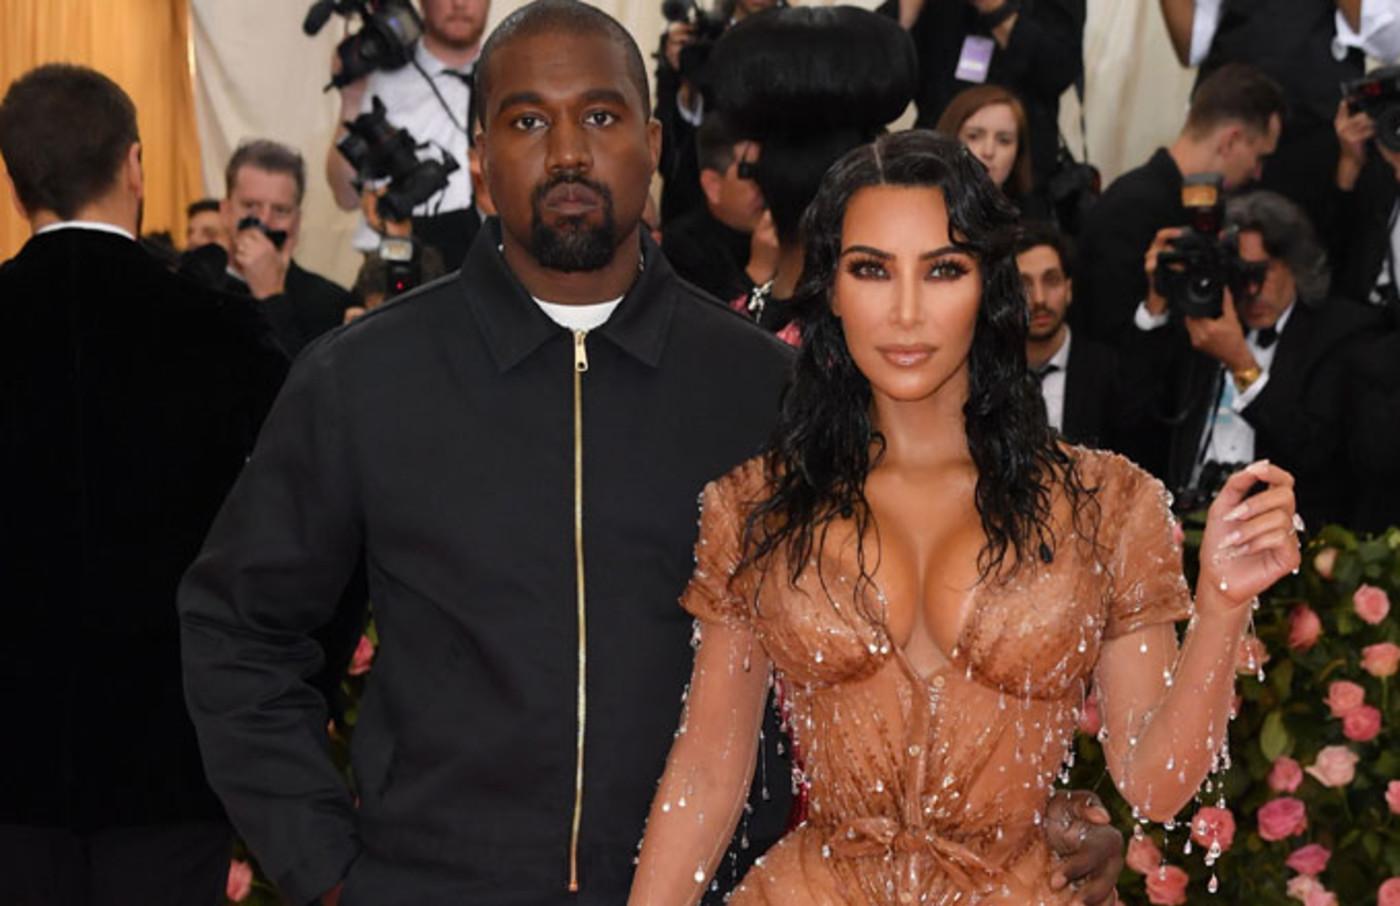 Kanye West and Kim Kardashian attend the Met Gala.